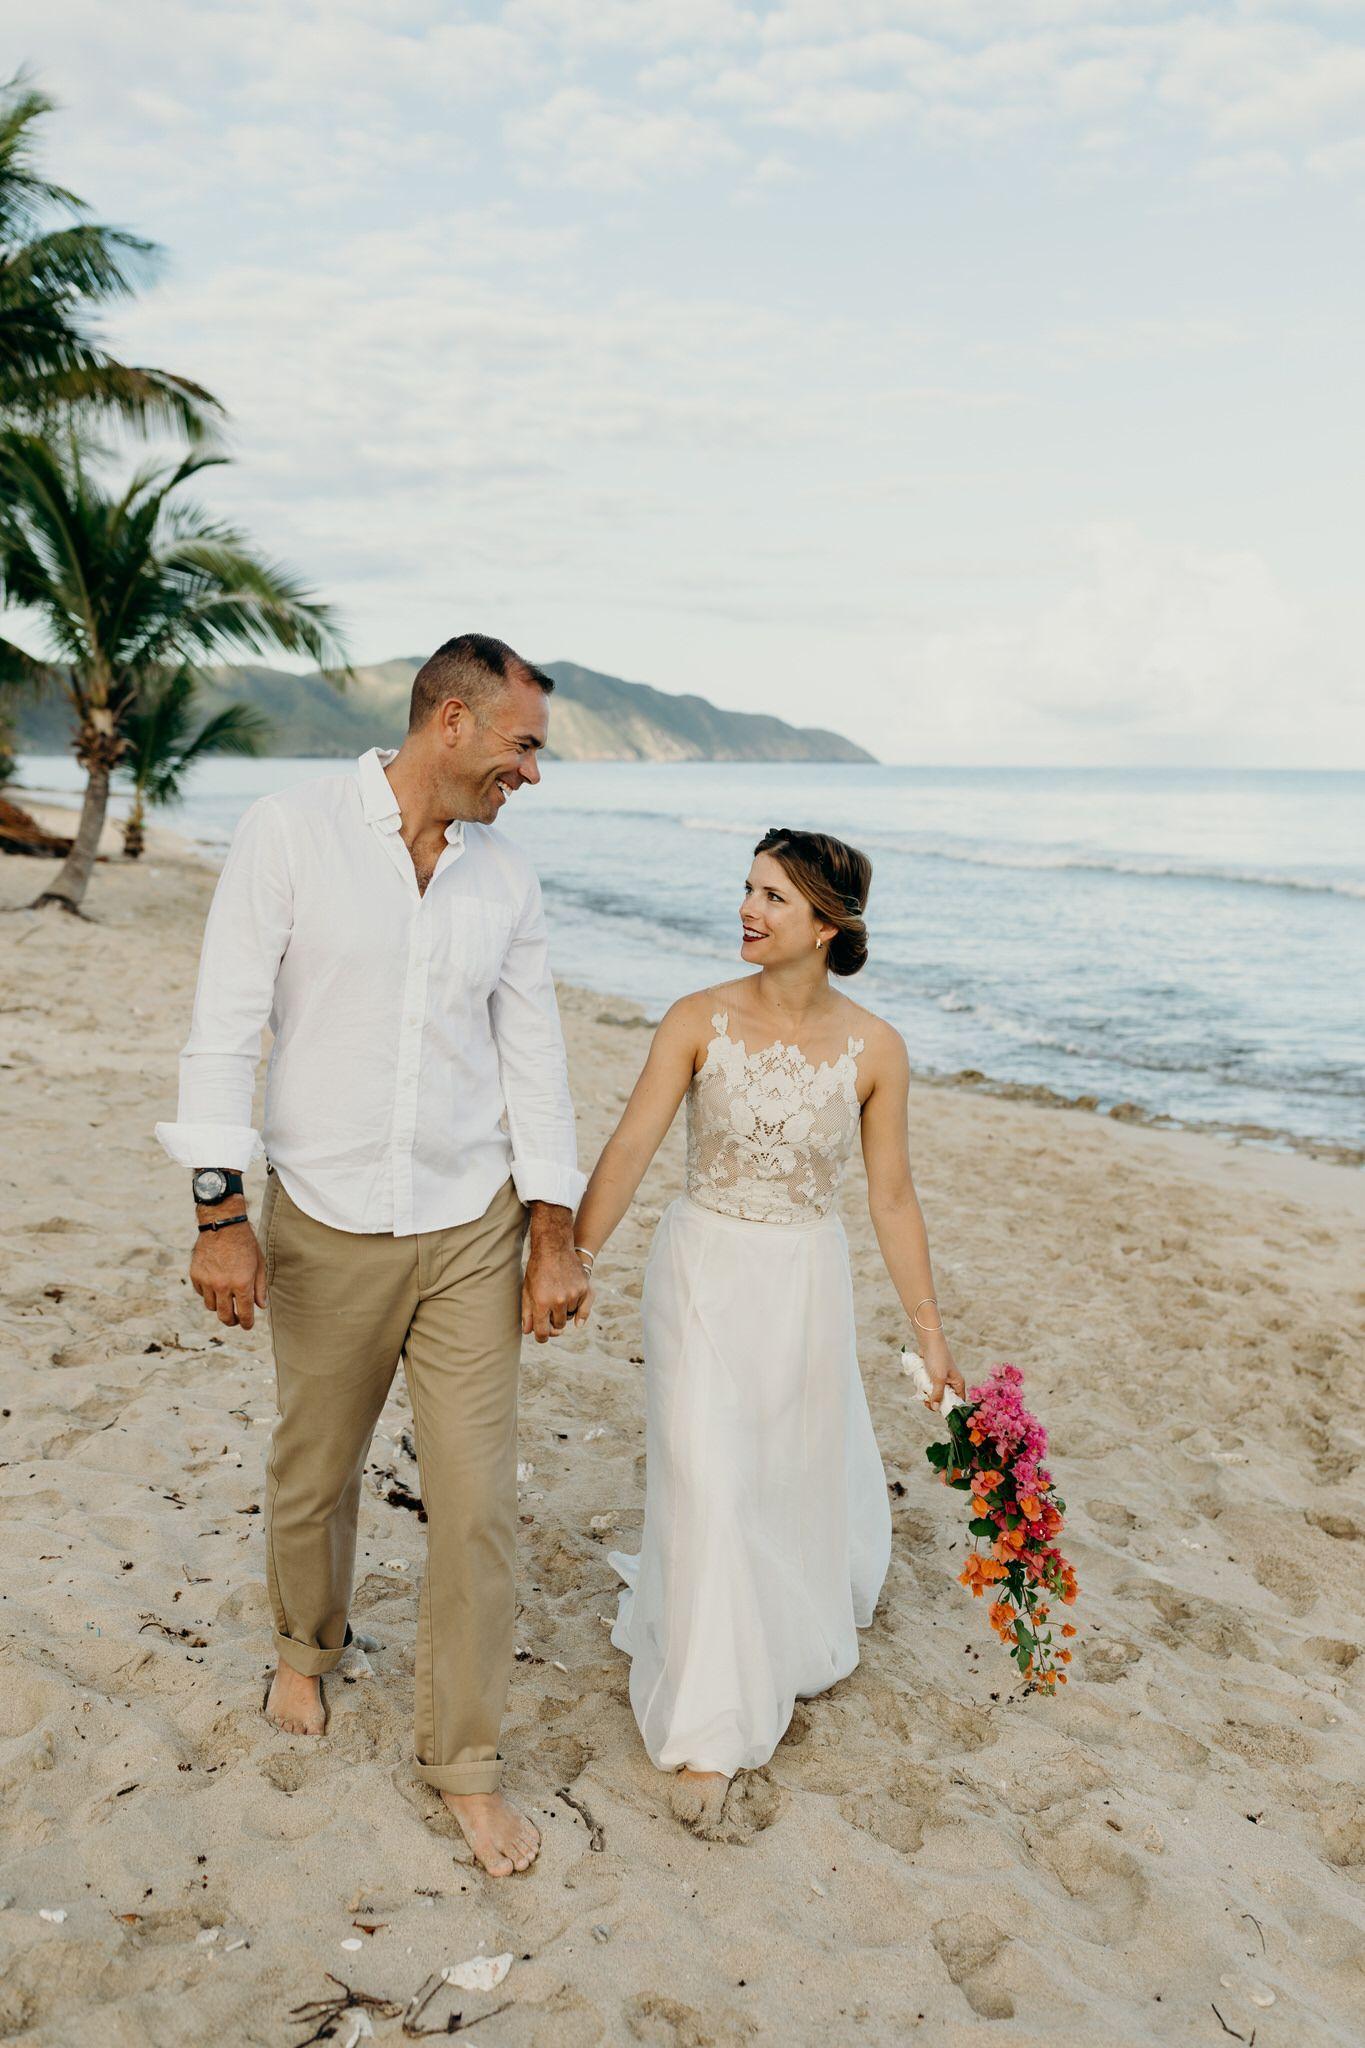 Intimate, Romantic Cane Bay Beach Elopement on St. Croix